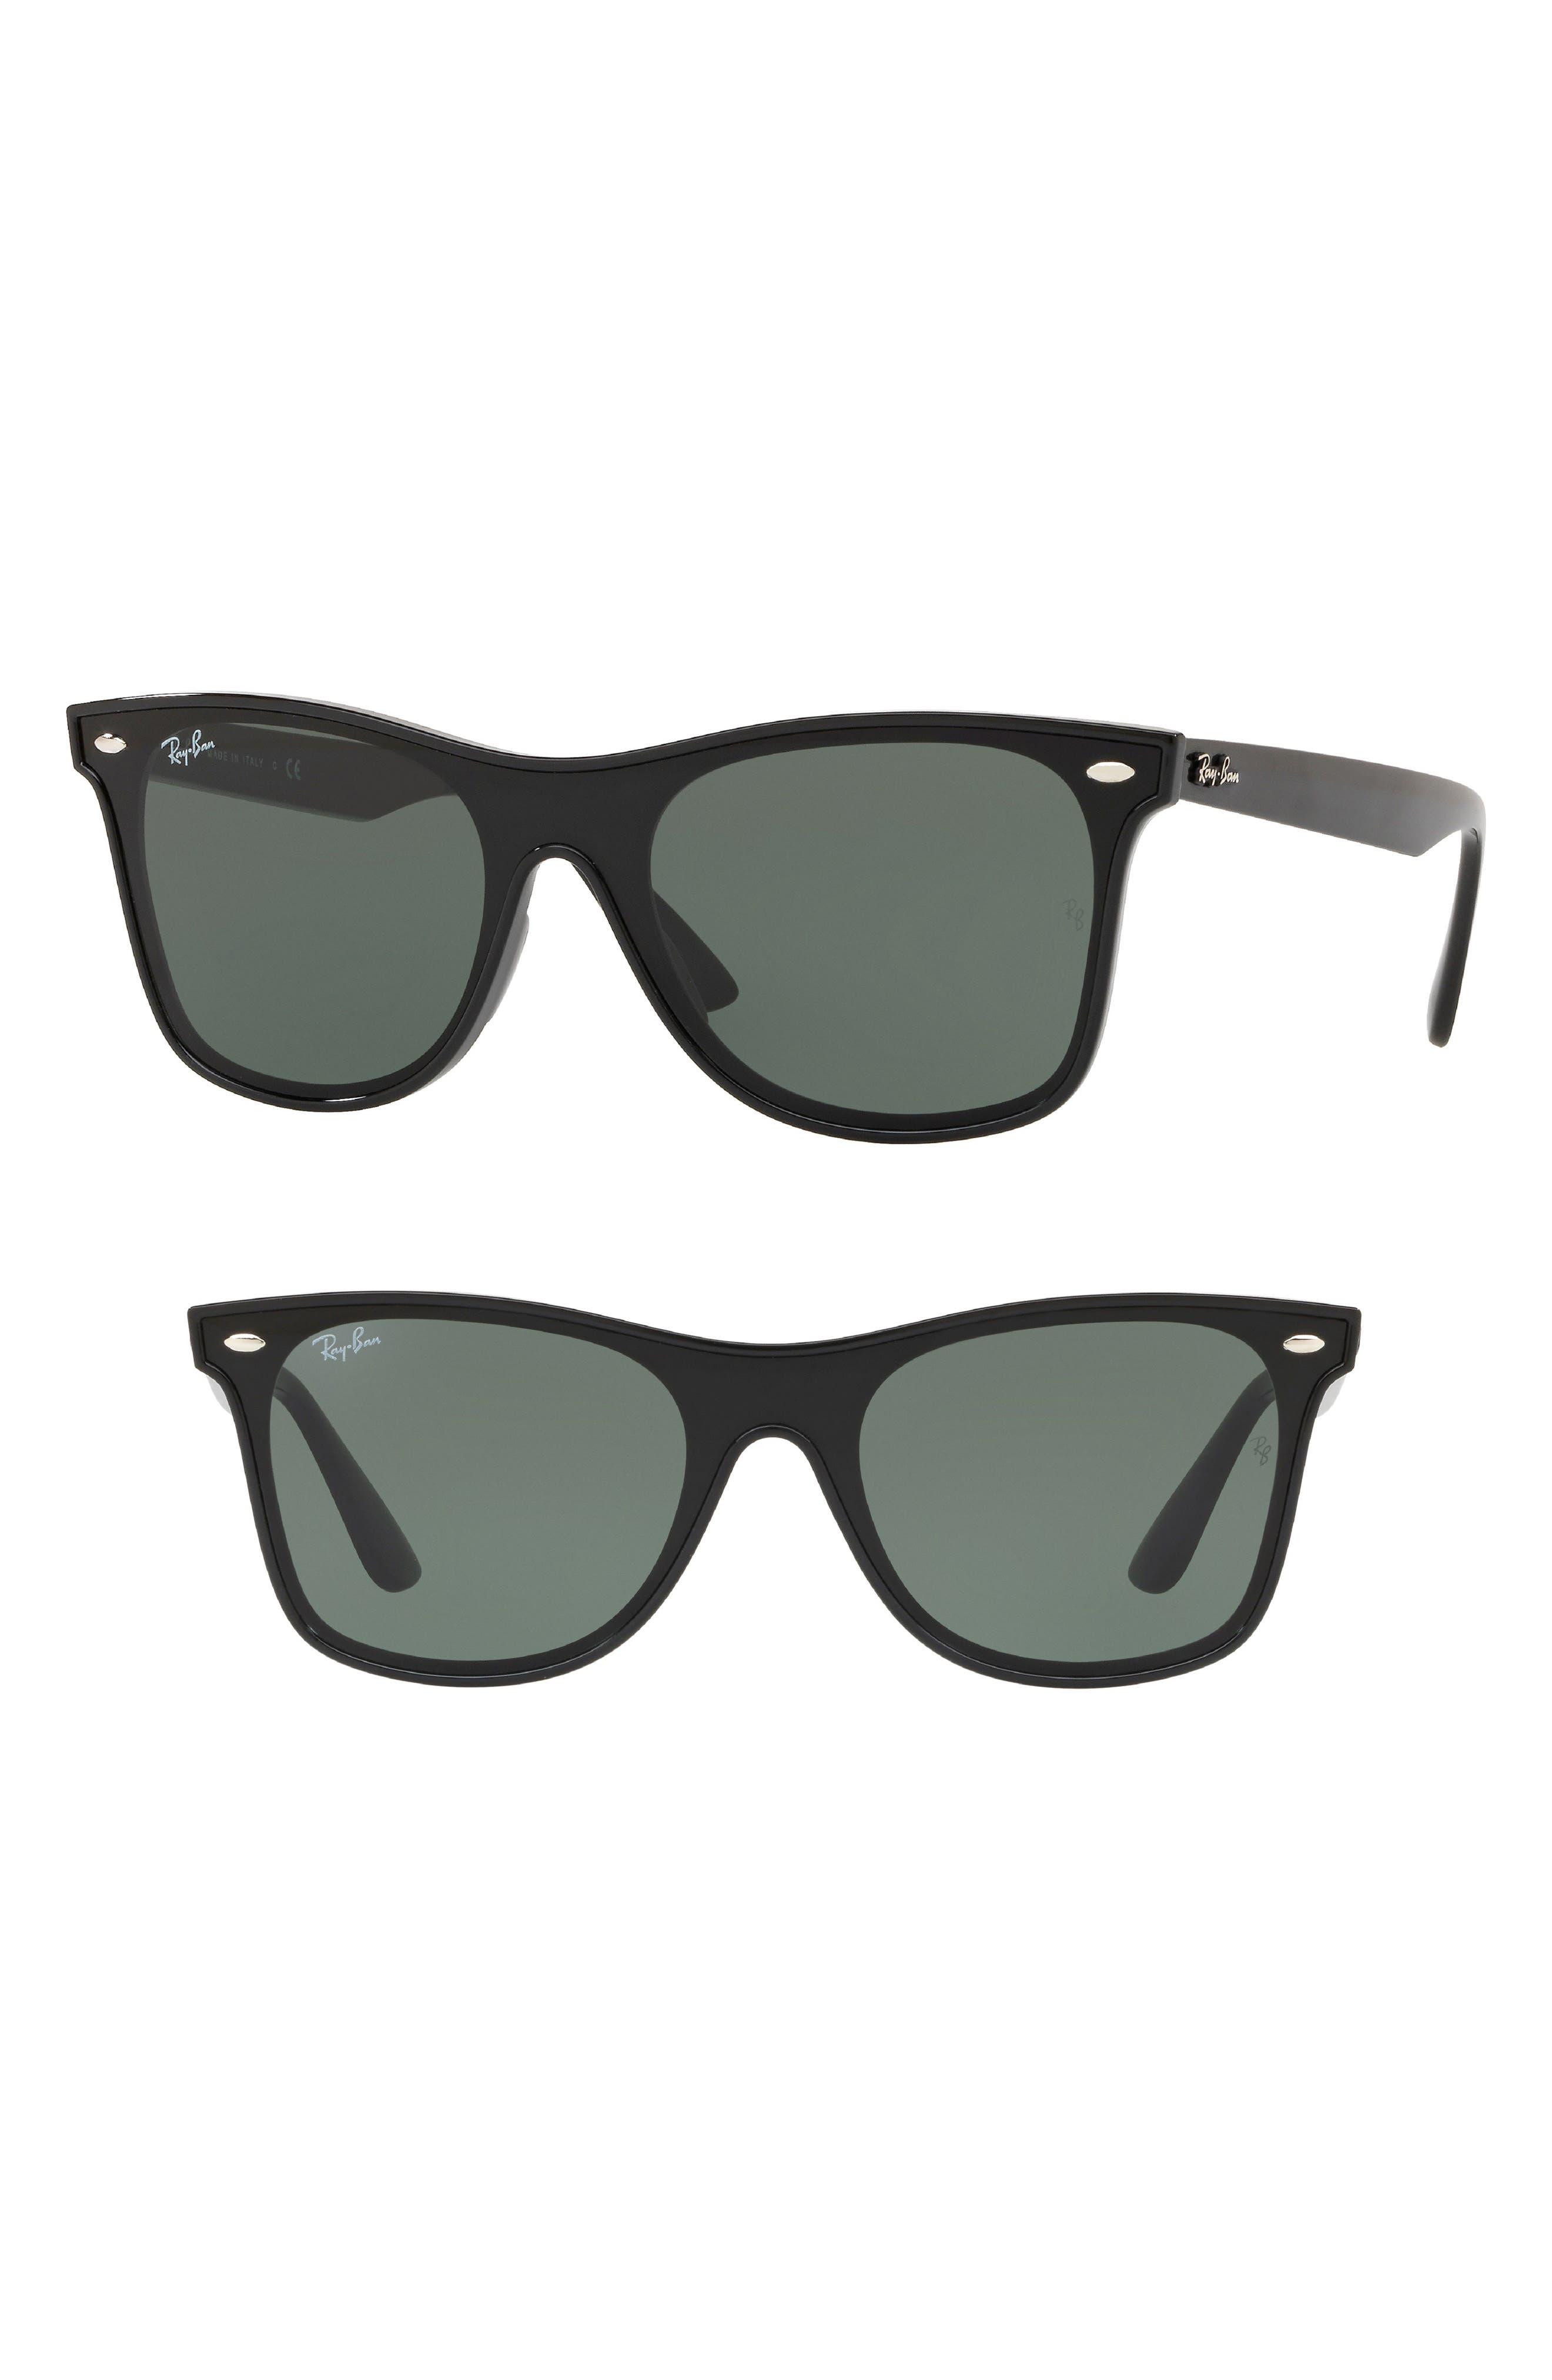 Ray-Ban Blaze 41mm Wayfarer Sunglasses